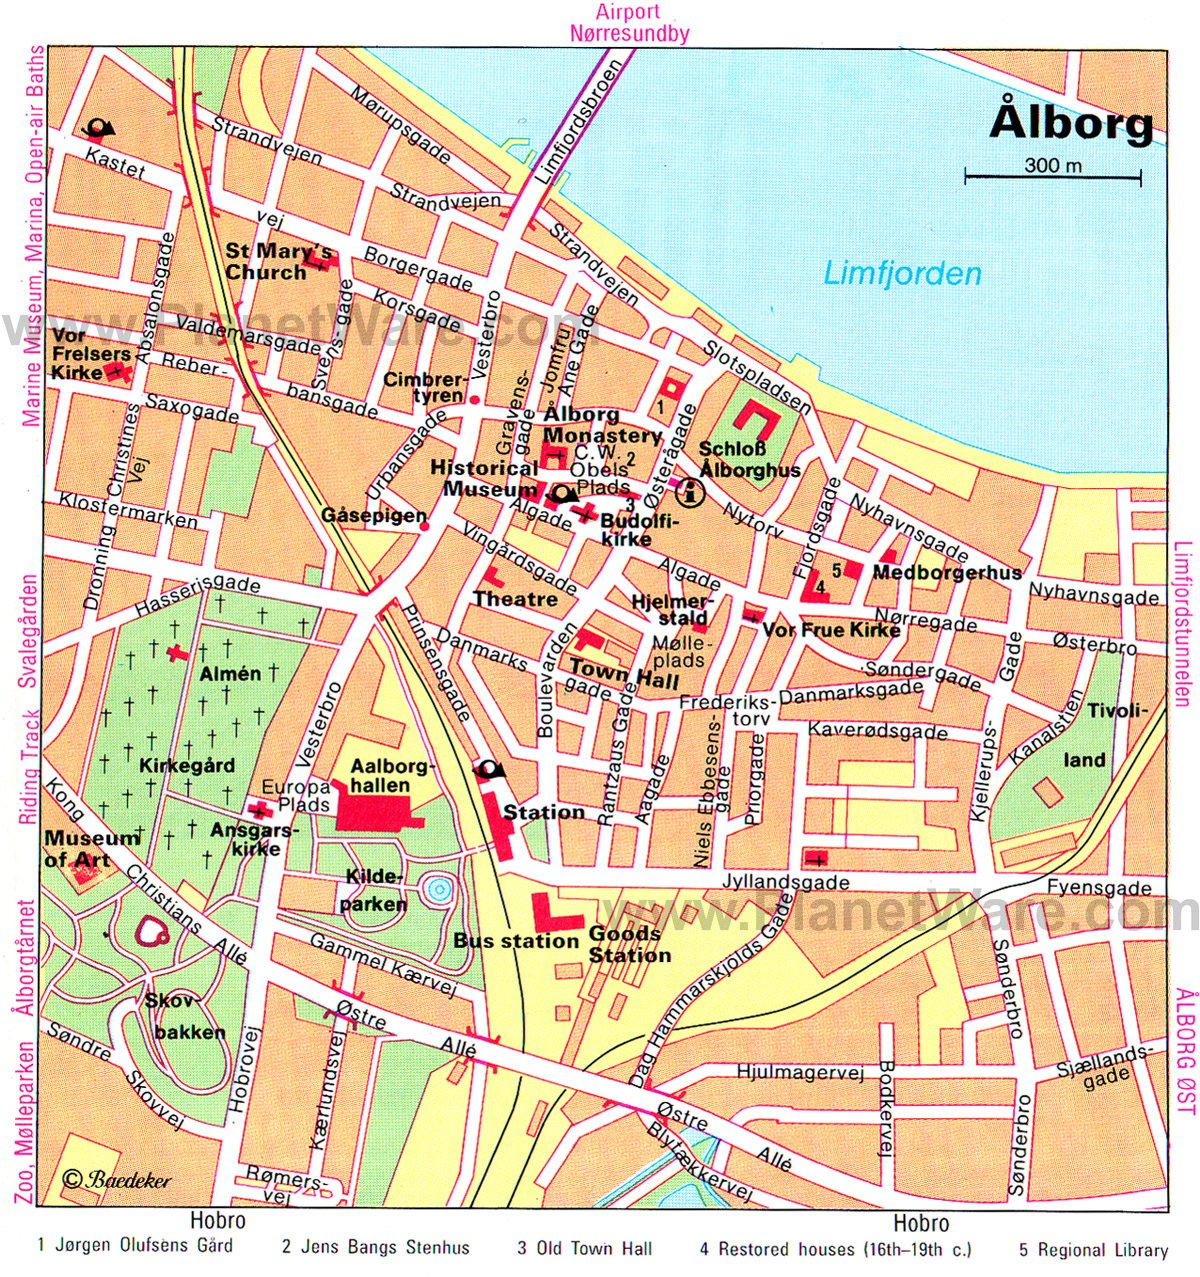 Aalborg Denmark Cruise Port of Call Aalborg Map